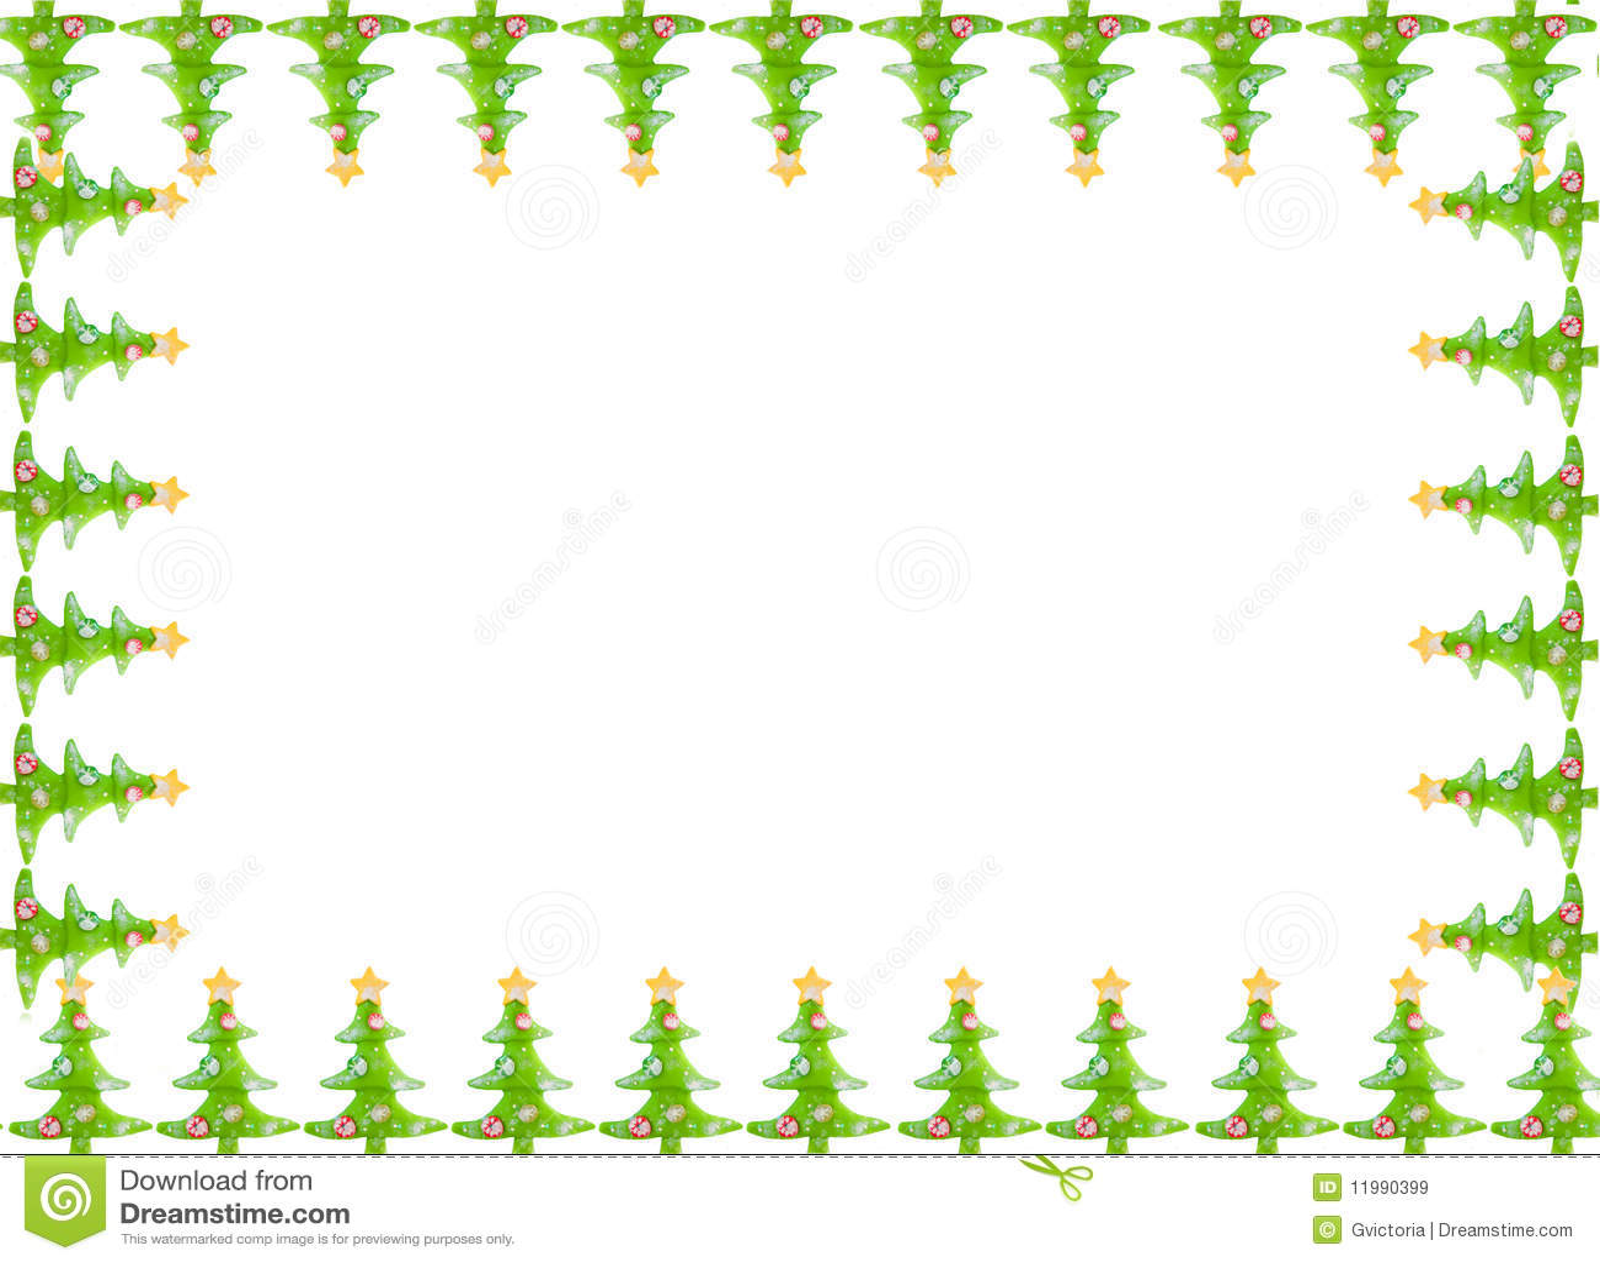 Blank Christmas Ornaments